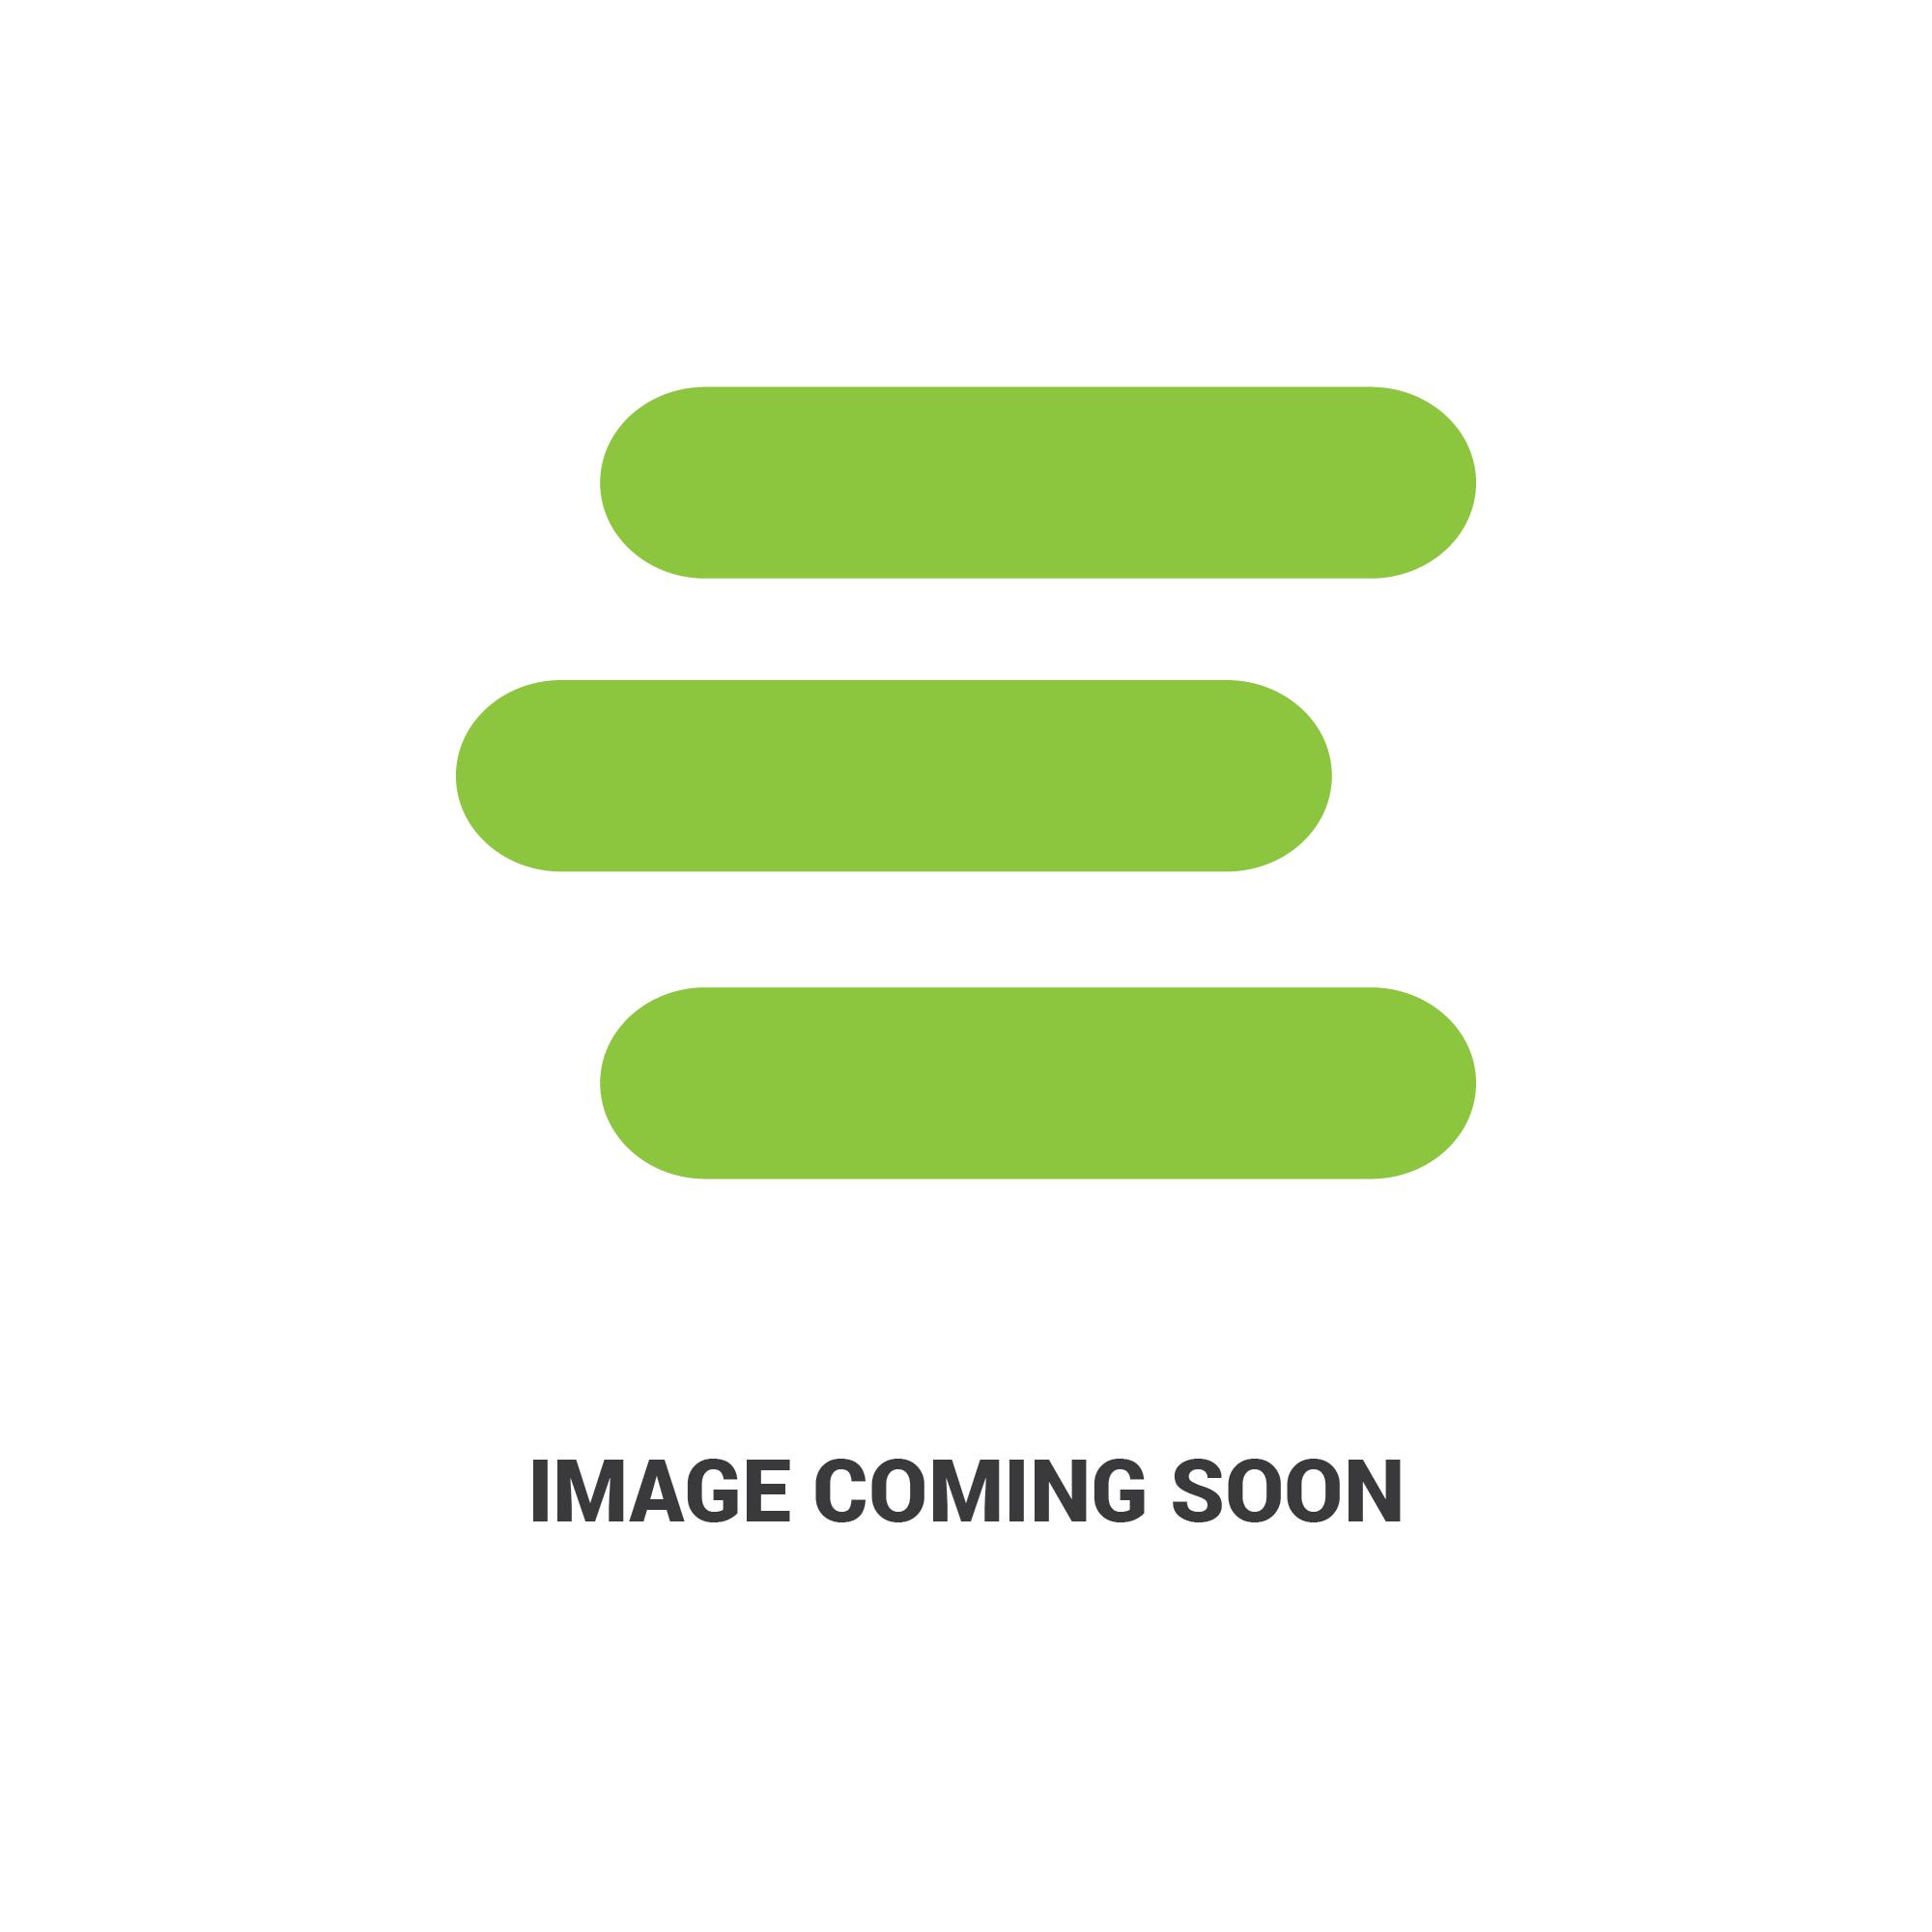 Propeller Shaft Couplings - Propeller Shafts & Related